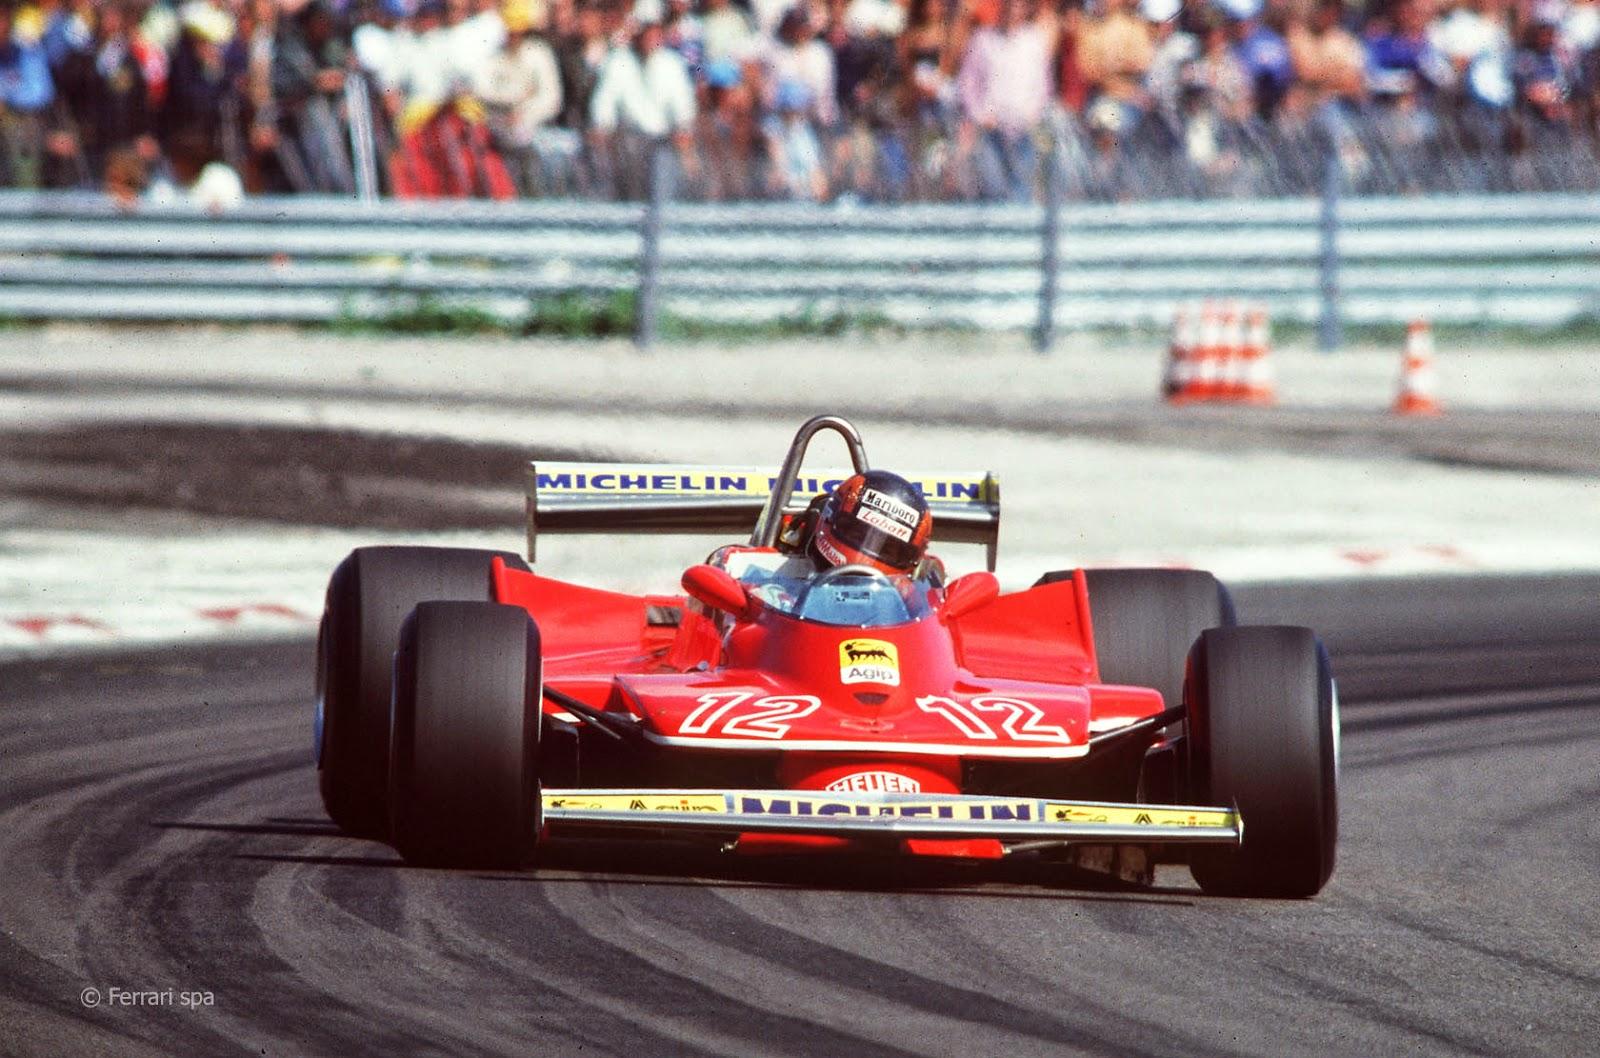 Gilles+Villeneuve12.jpg